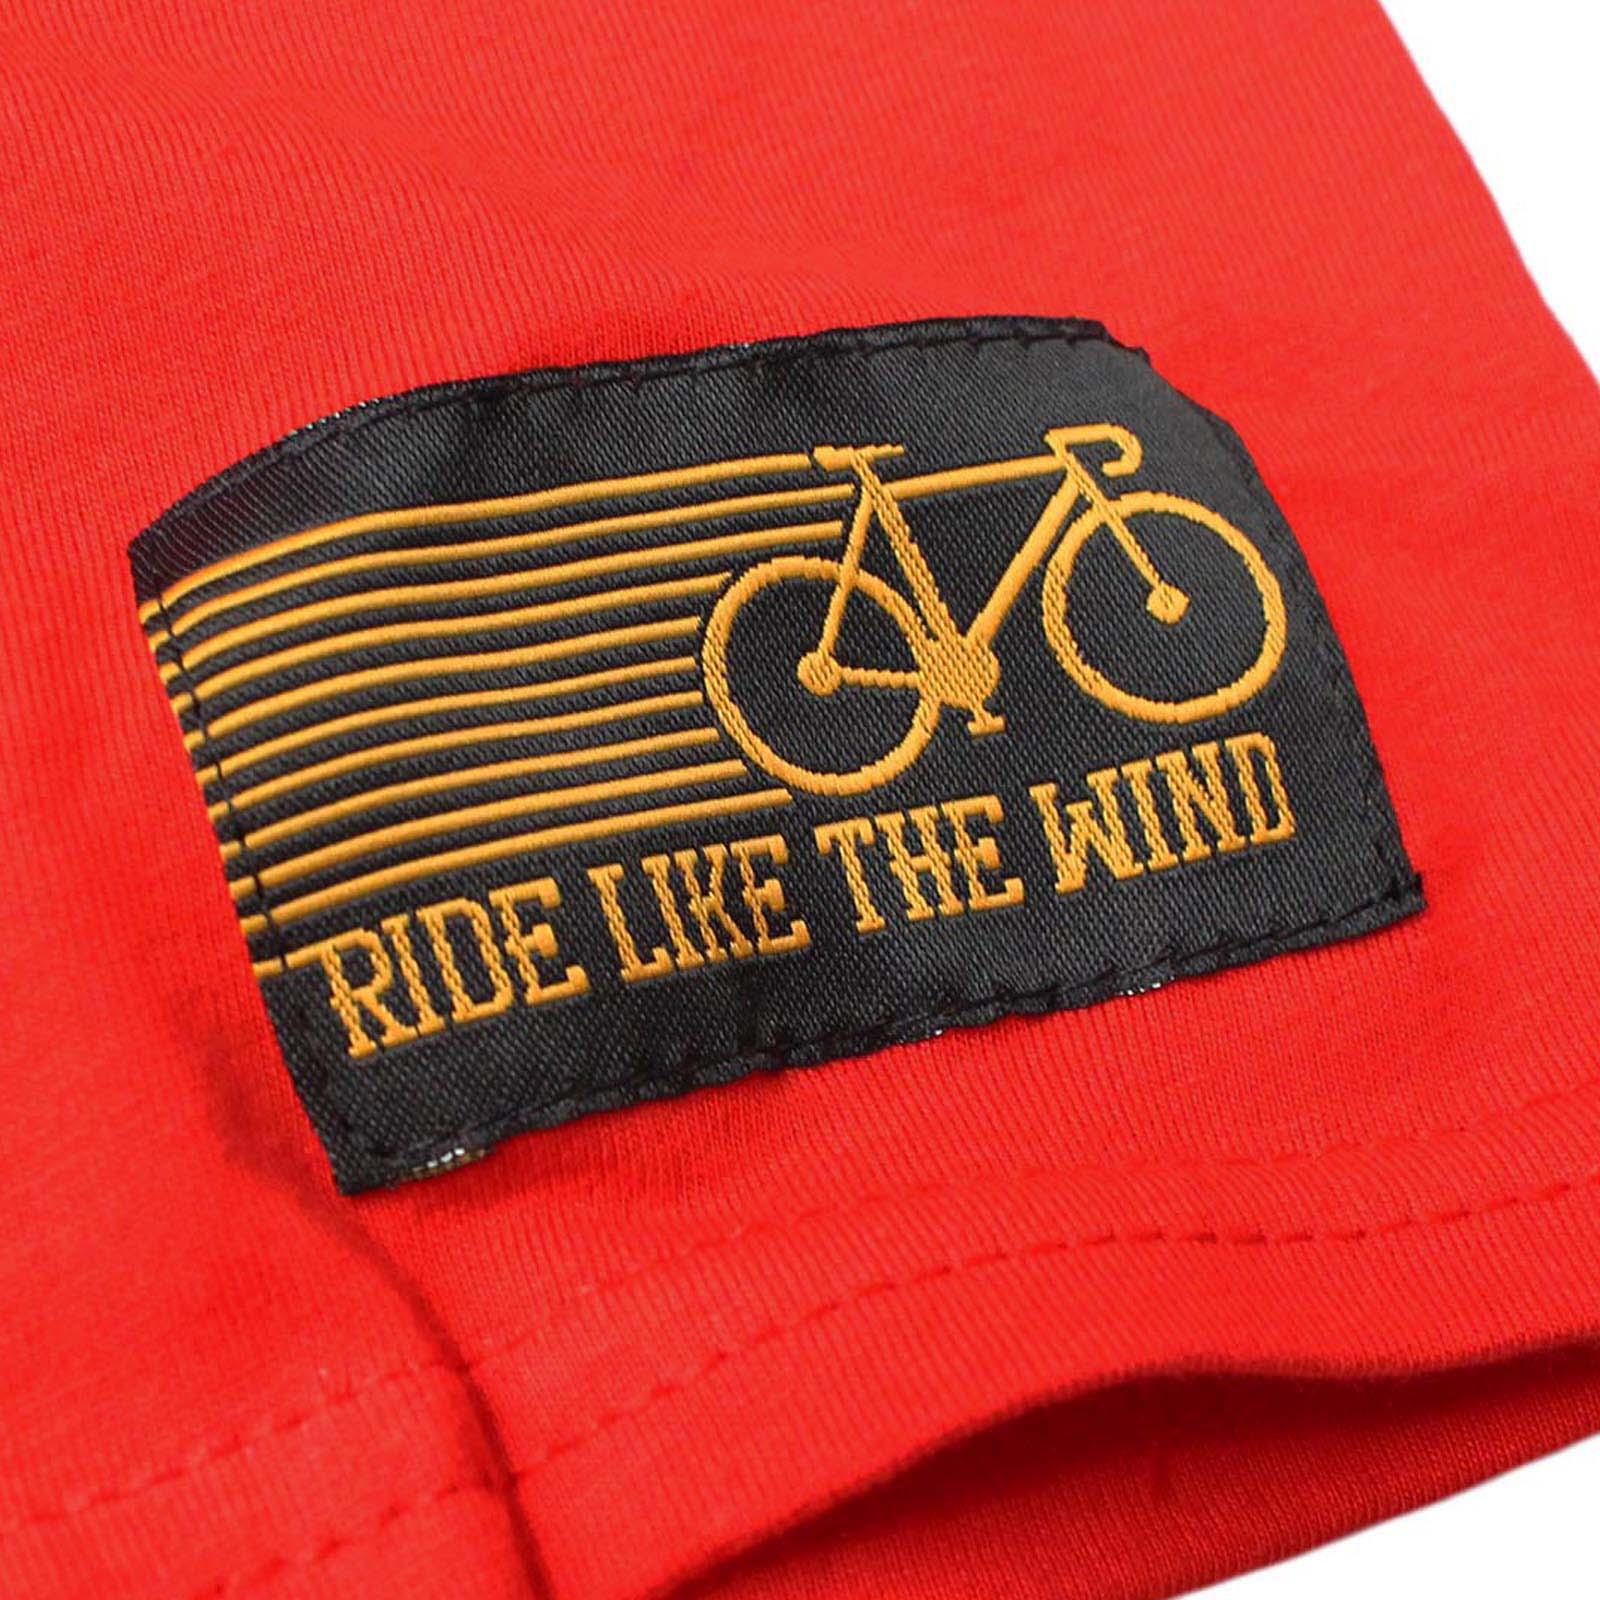 Cycling-Yeah-My-Bike-Did-Cost-More-funny-top-Birthday-tee-T-SHIRT-T-SHIRT thumbnail 29